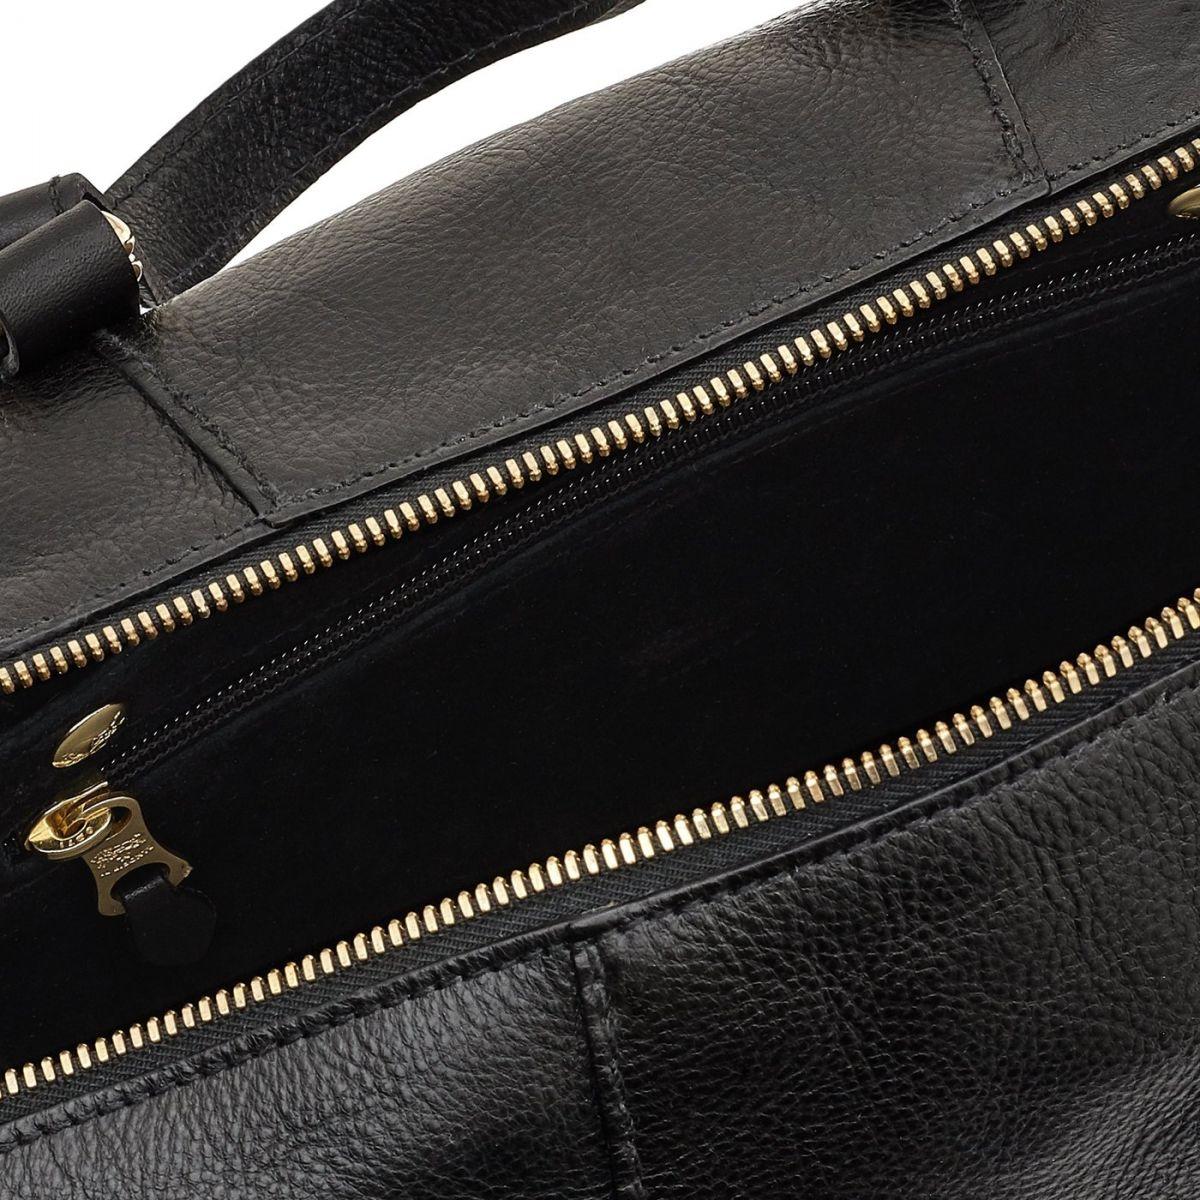 Women's Handbag Stromboli in Cowhide Leather BTH105 color Black | Details